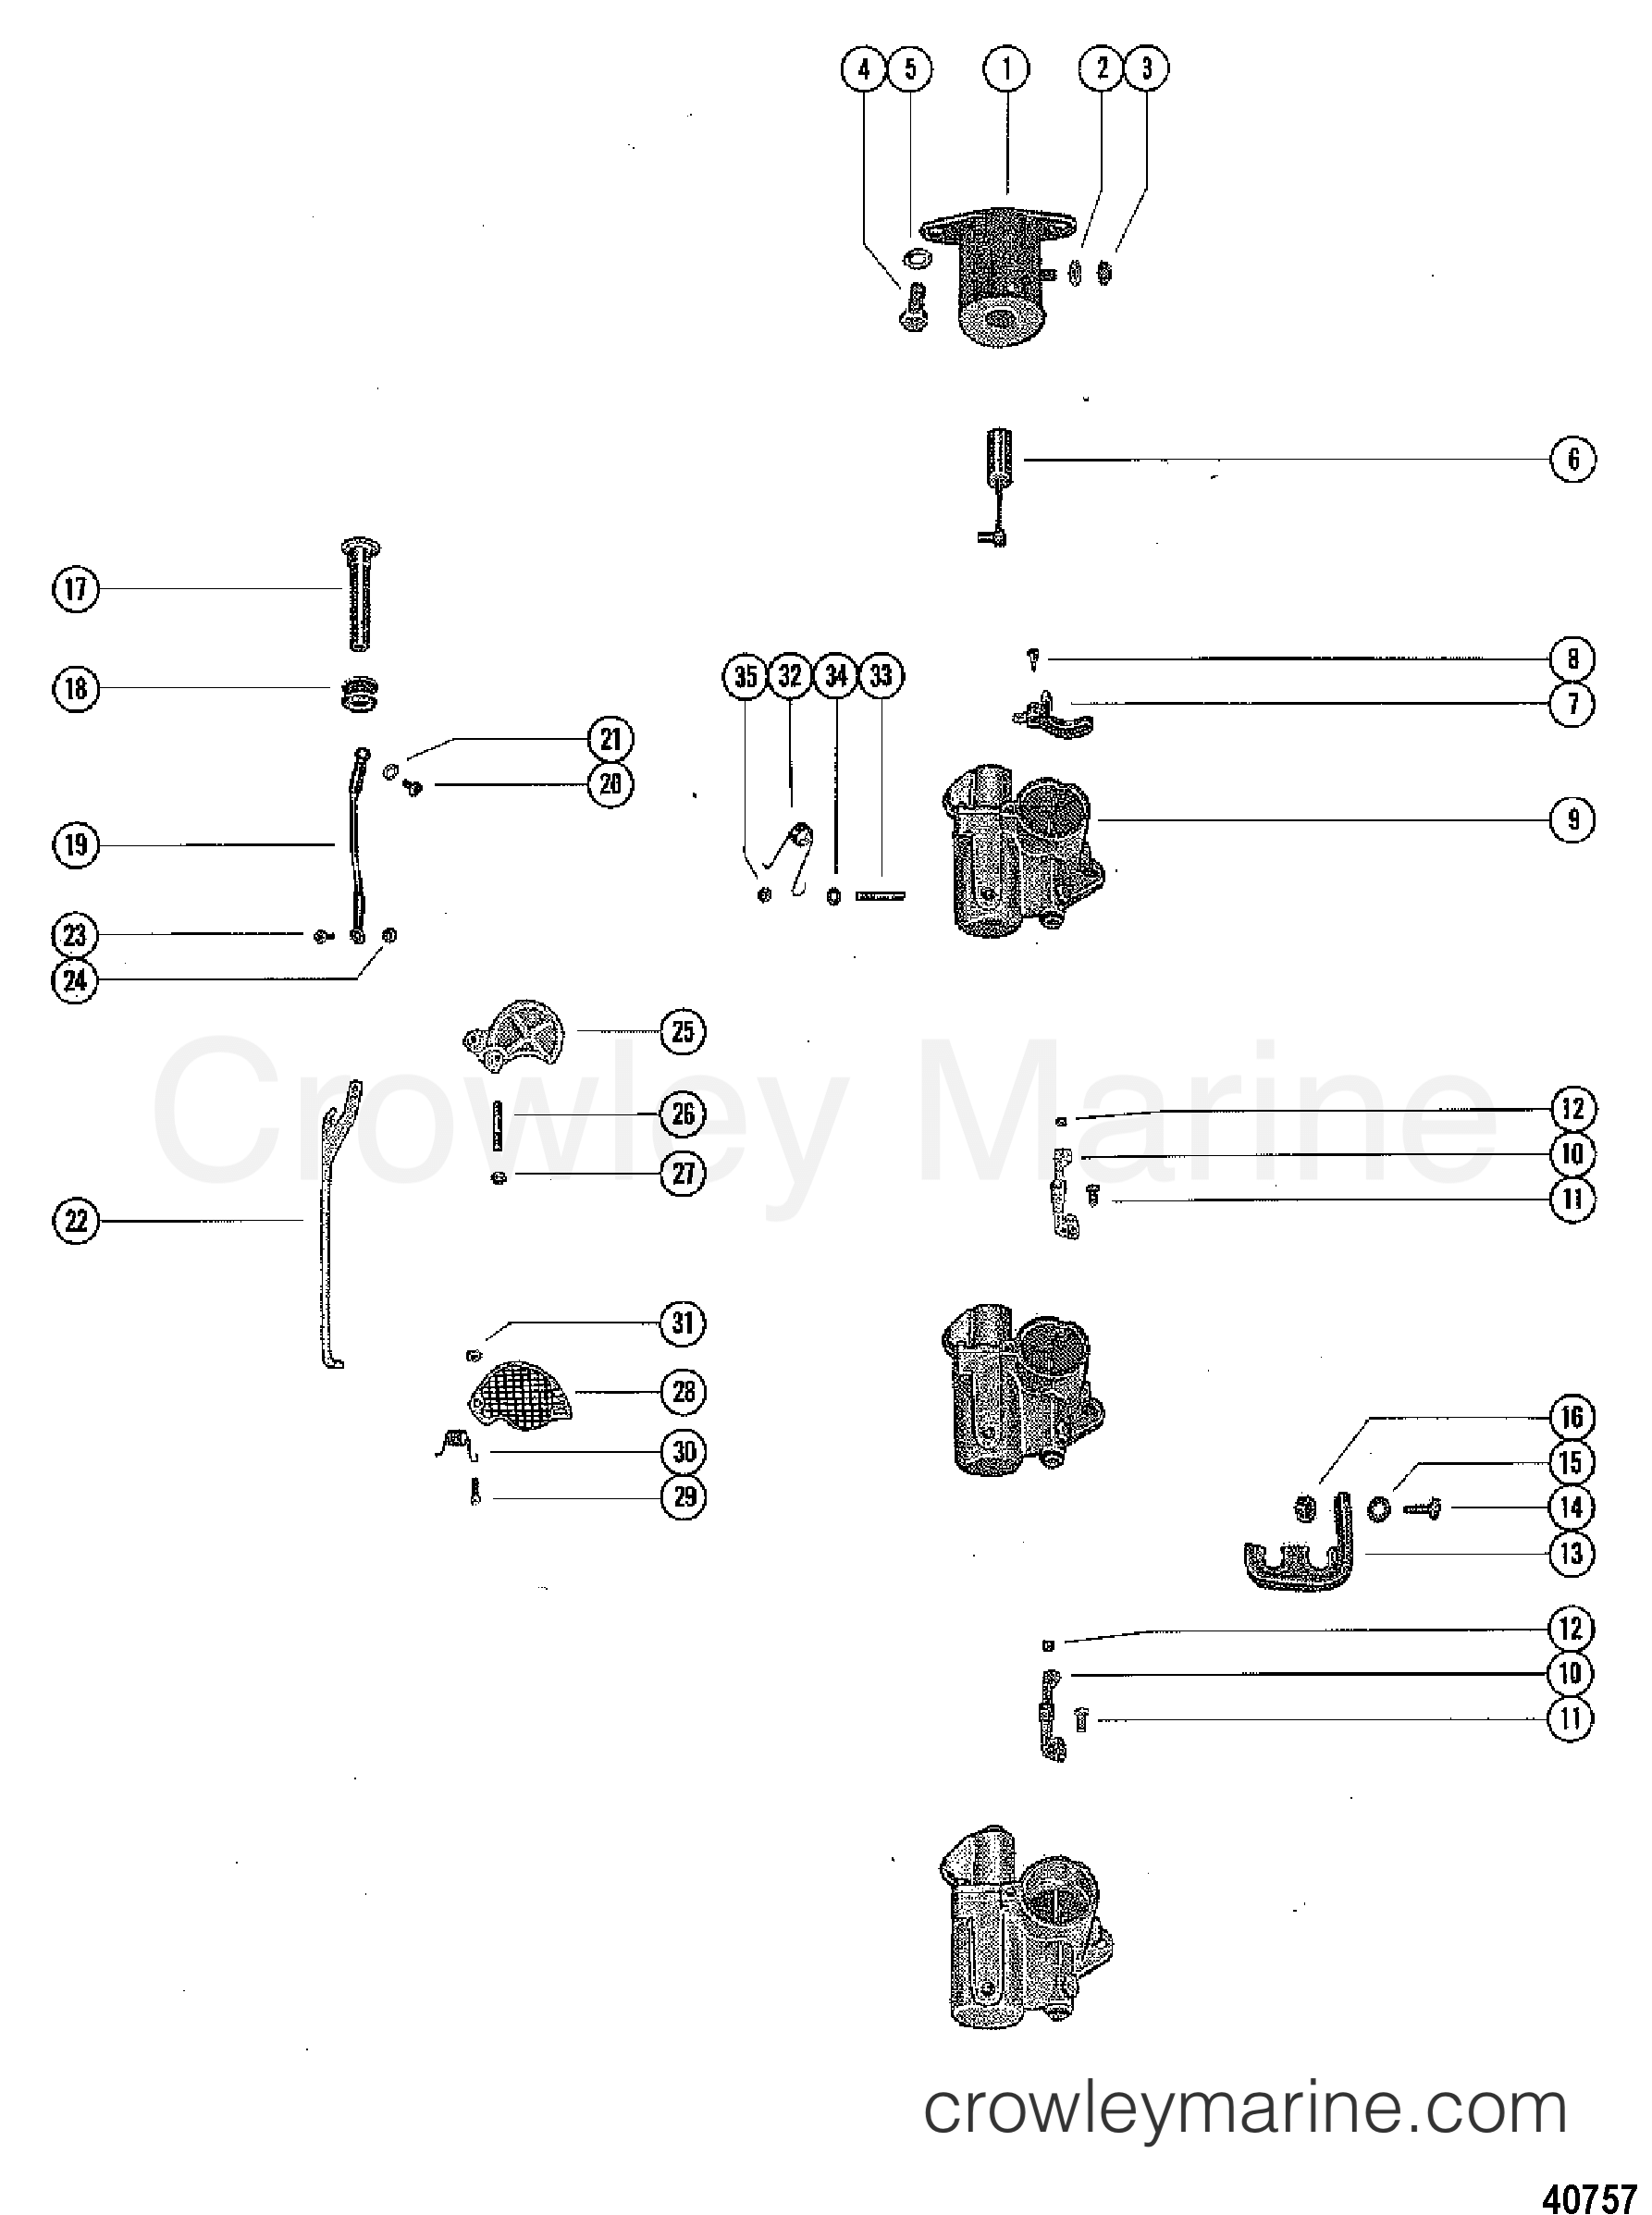 mercury outboard wiring harness color code 1976 mercury outboard diagram carburetor linkage and choke solenoid - 1976 mercury ...